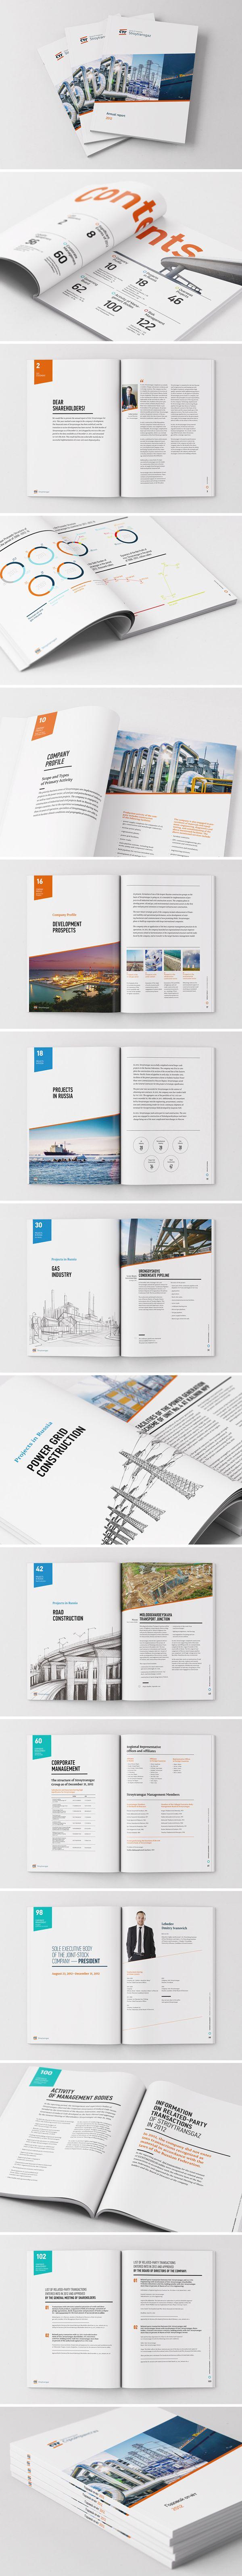 Stroytransgaz annual report by Praxis Advance, via Behance